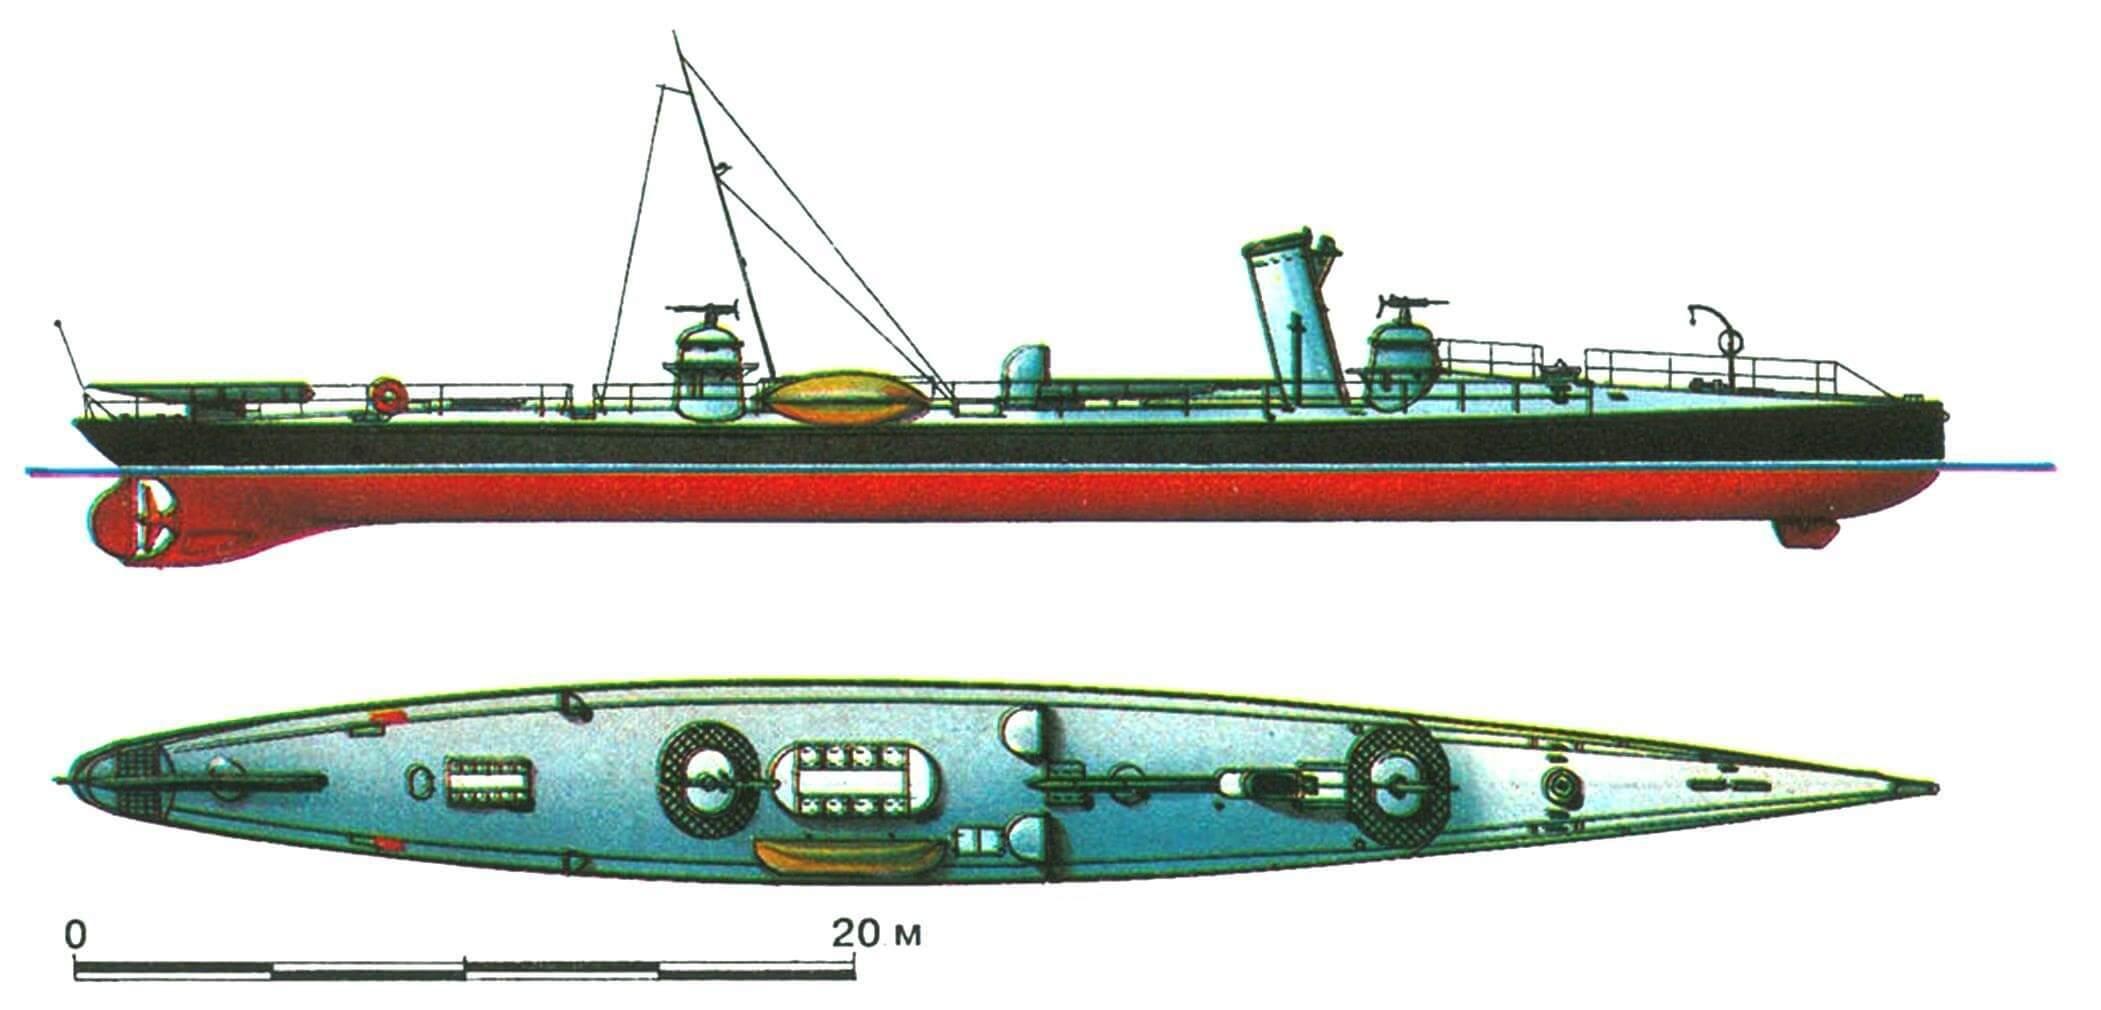 51. Миноносец S-67, Германия, 1893 г.